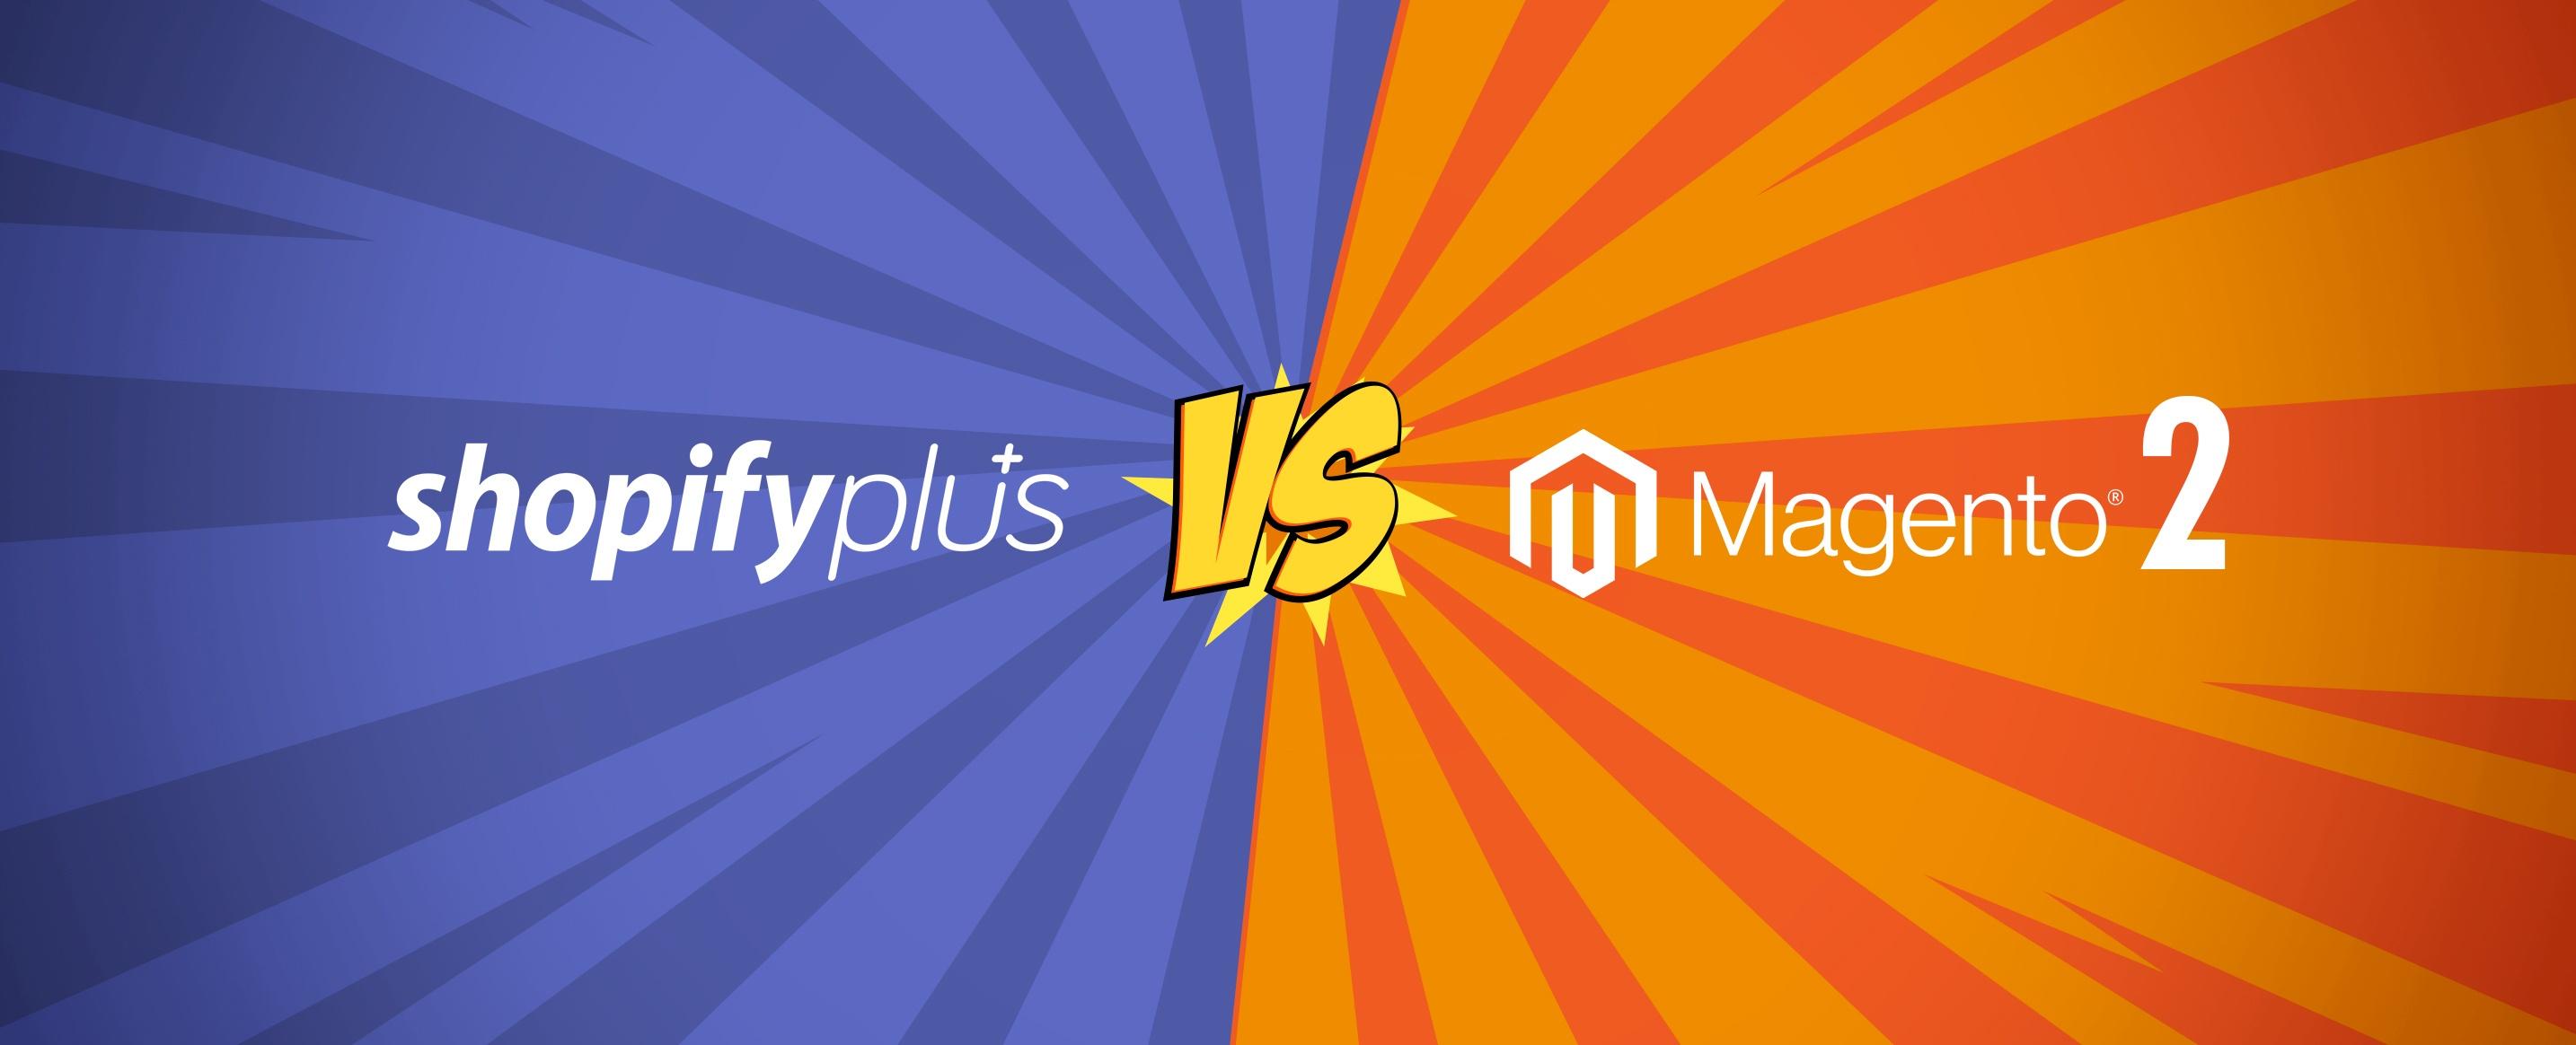 Magento 2 Commerce Vs Shopify Plus – An In-Depth Comparison